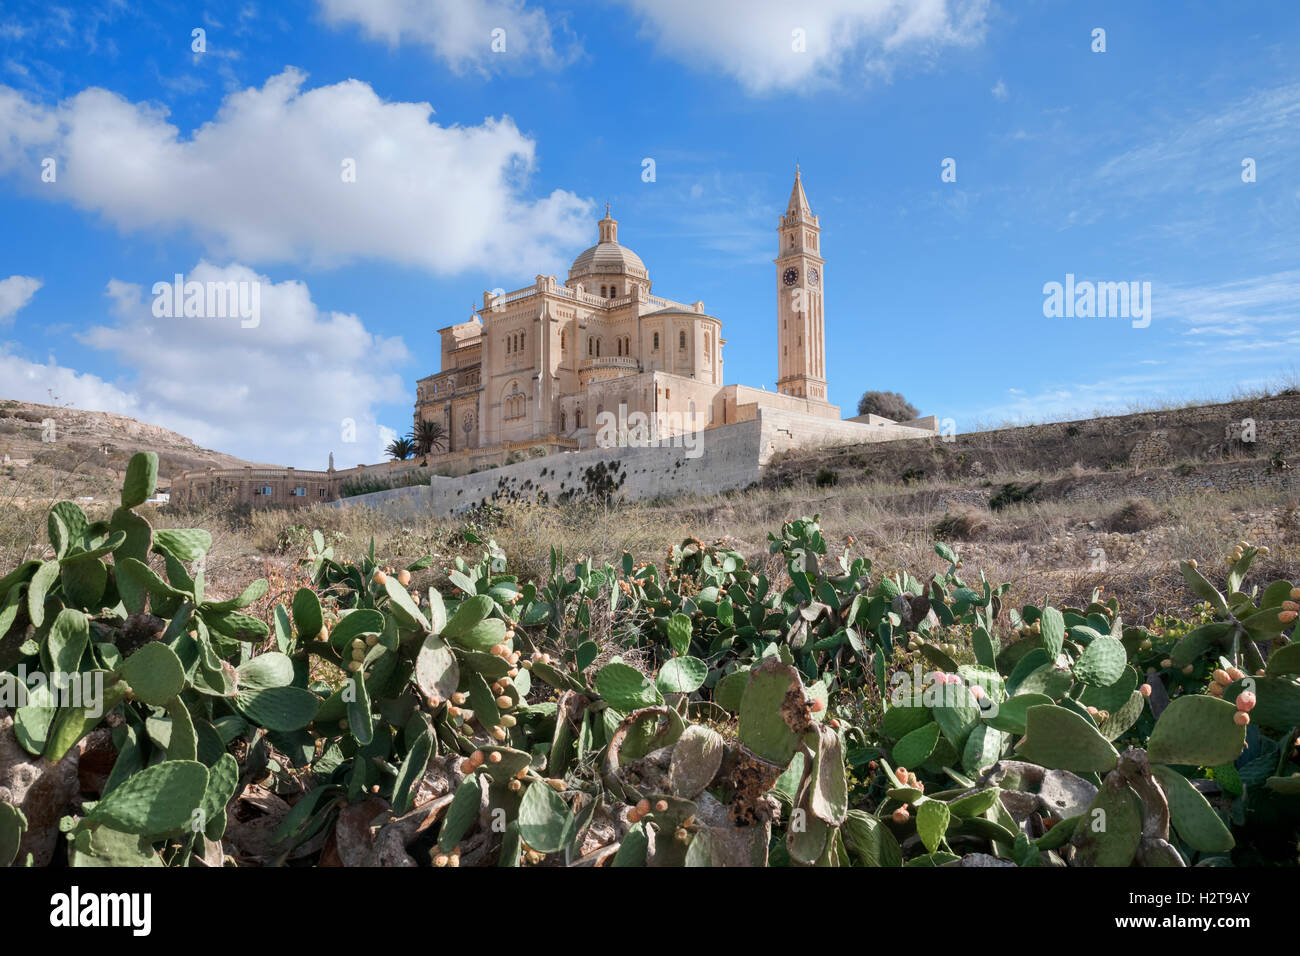 Basílica de Ta Pinu, Gharb, Gozo, Malta Imagen De Stock